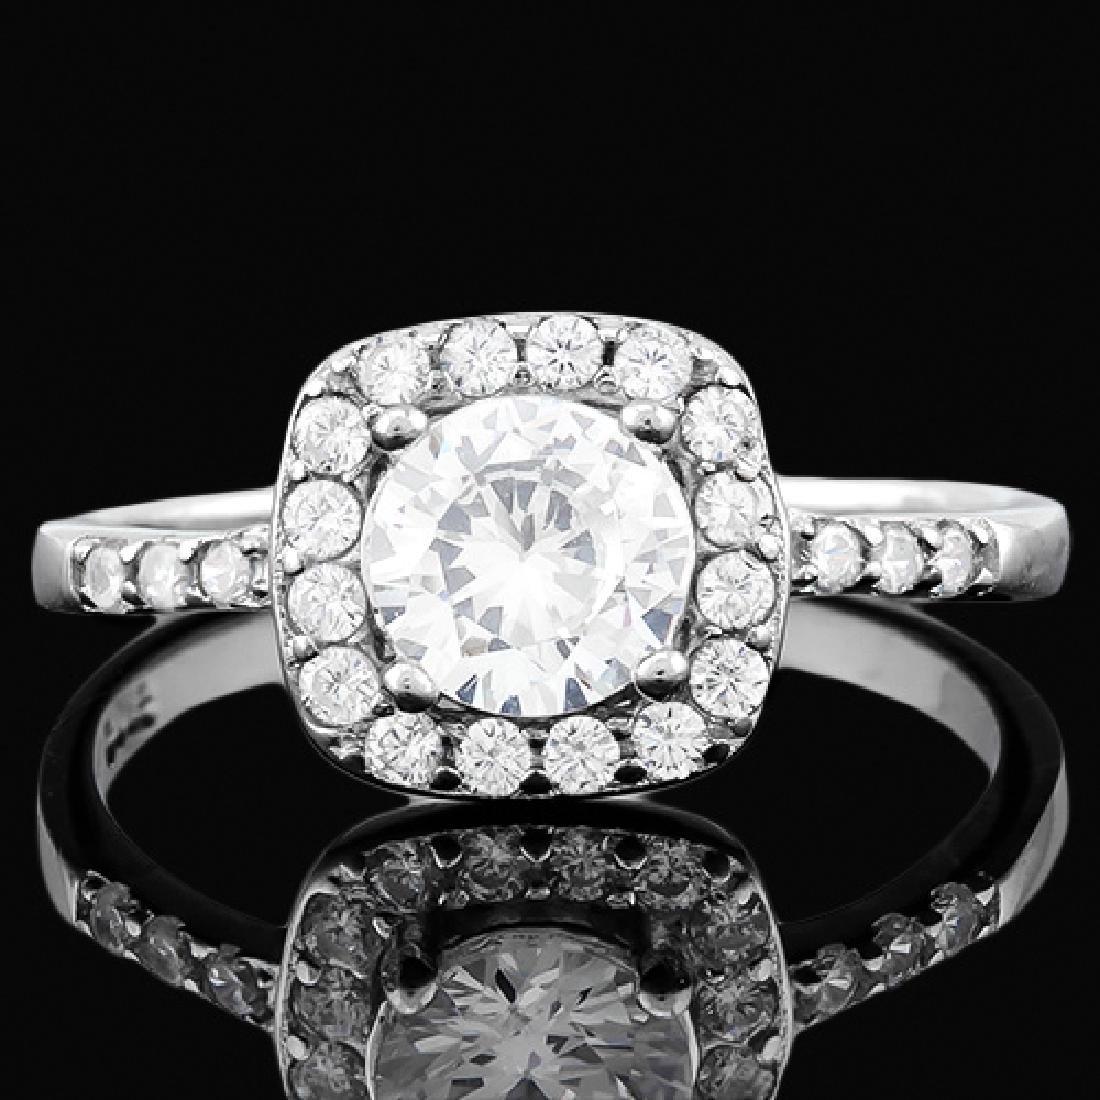 1 1/2 CARAT (27 PCS) FLAWLESS CREATED DIAMOND 925 STERL